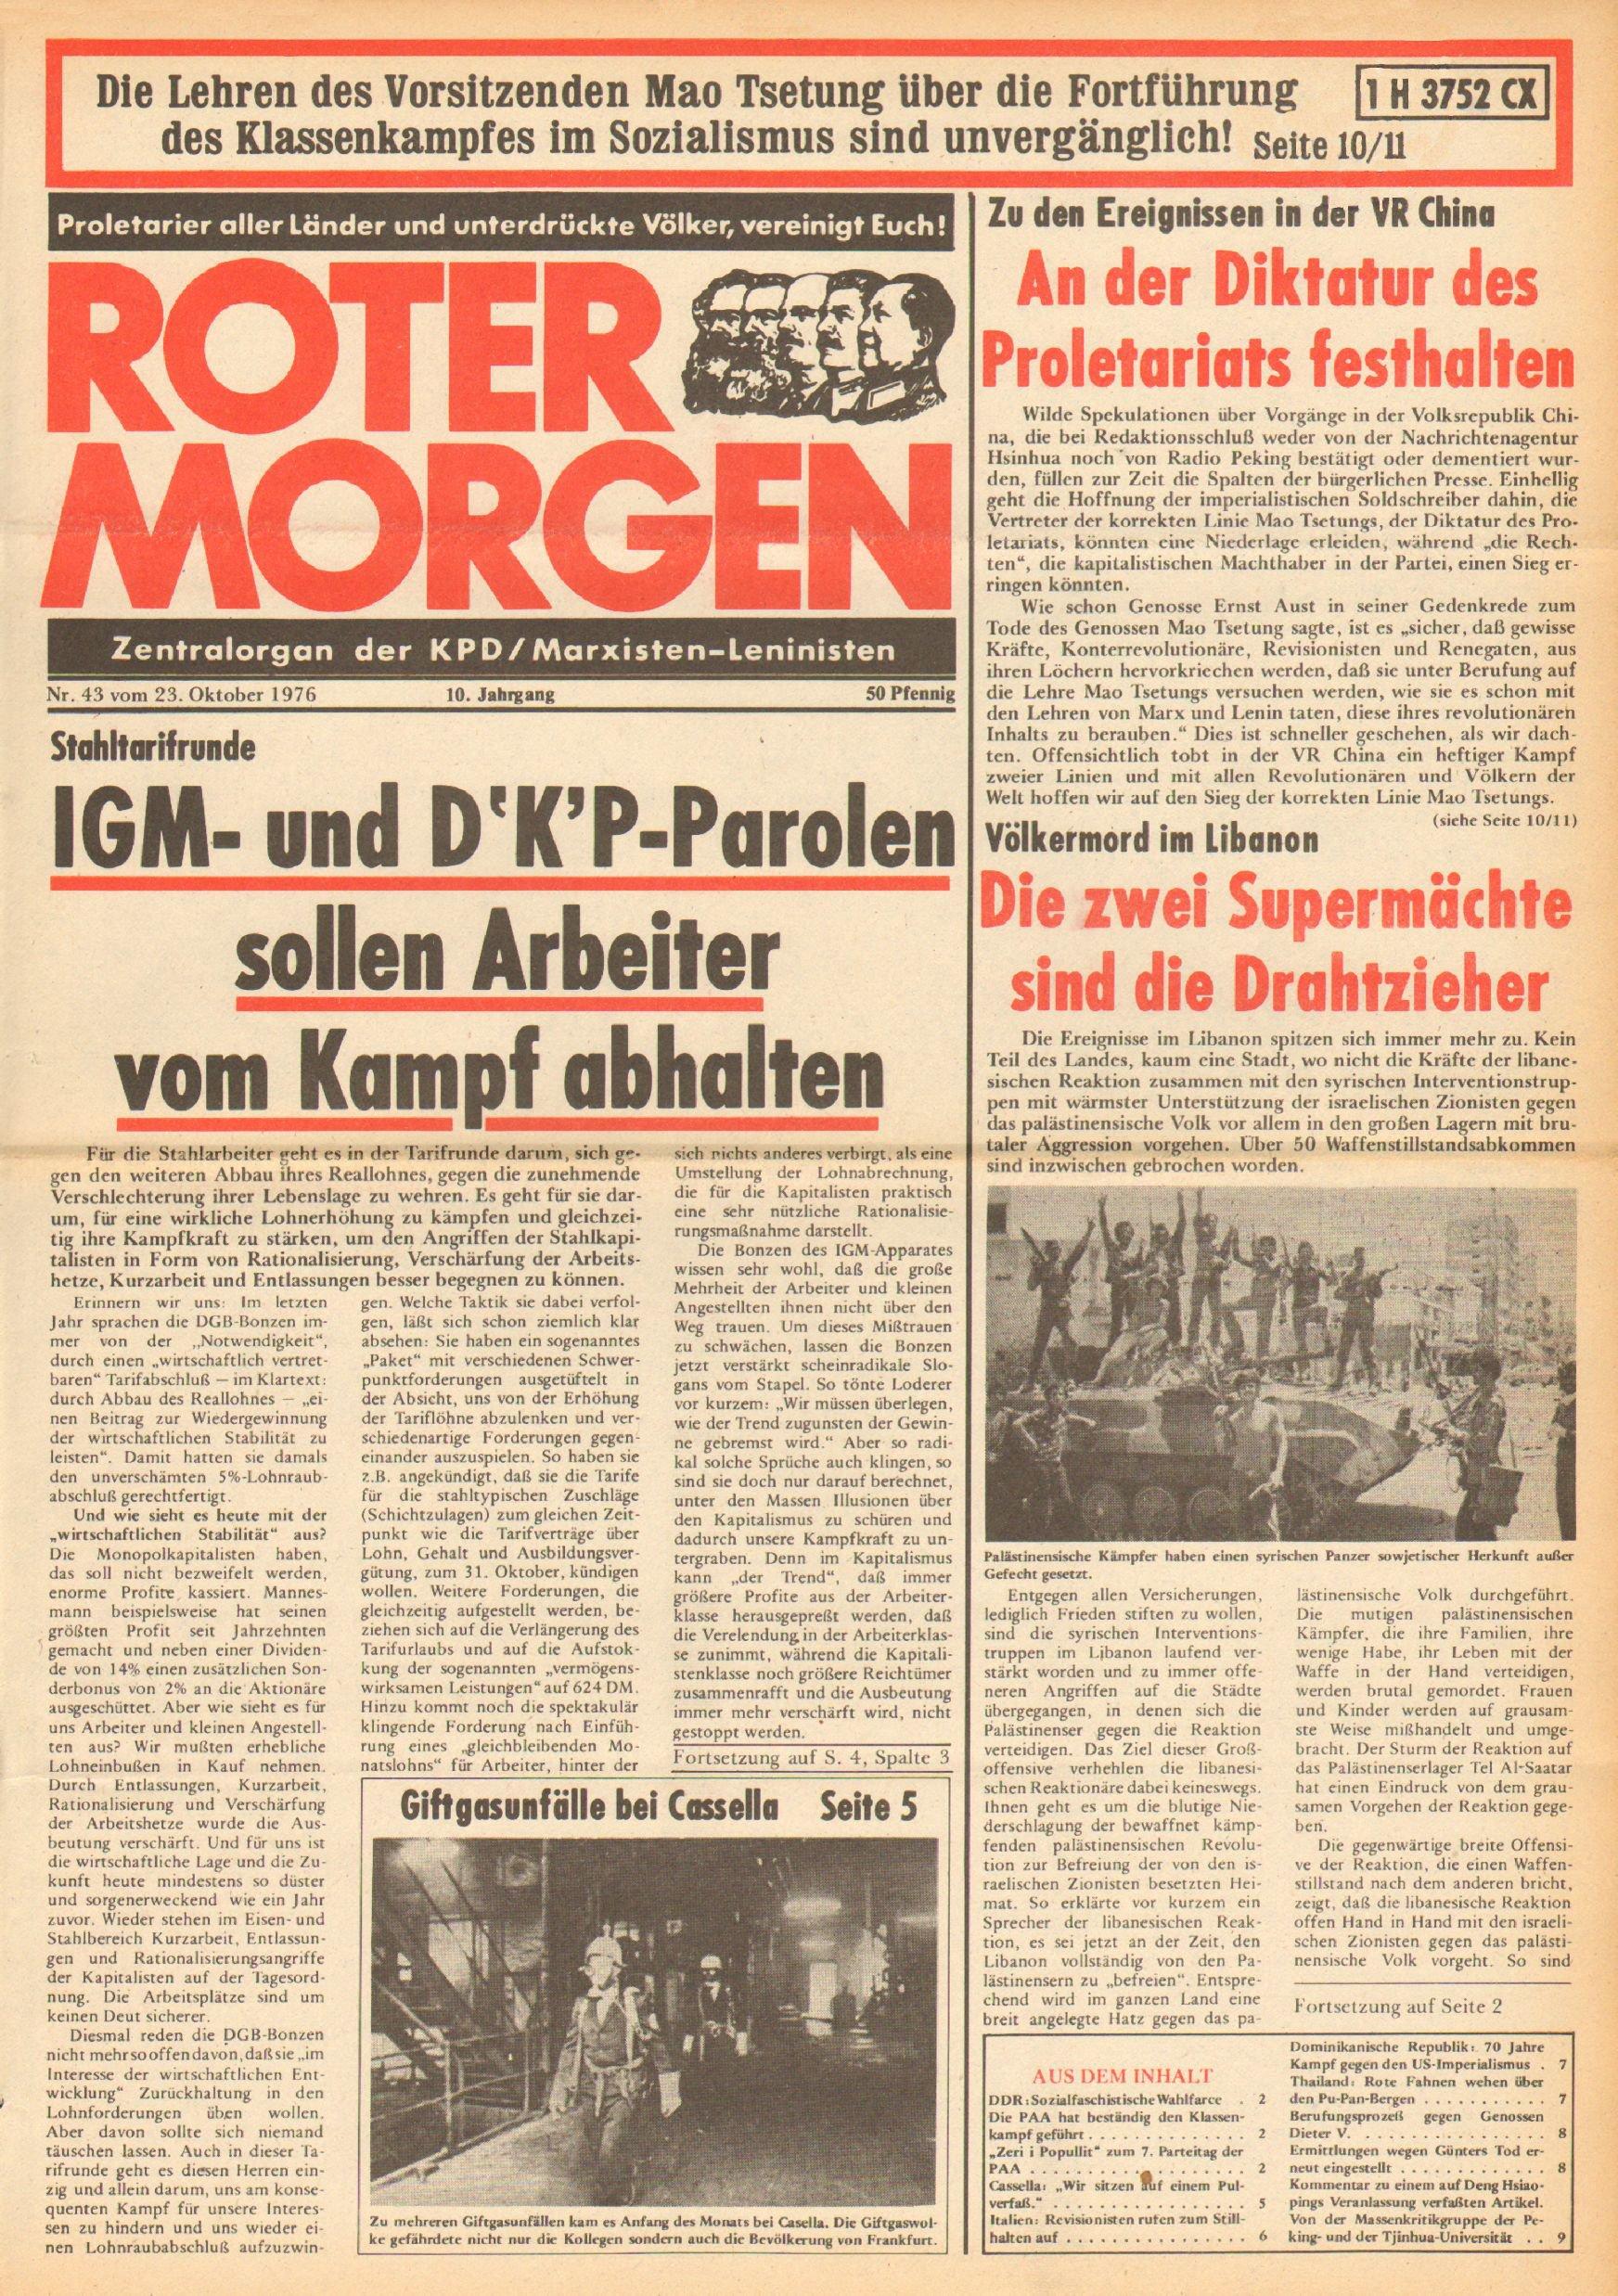 Roter Morgen, 10. Jg., 23. Oktober 1976, Nr. 43, Seite 1